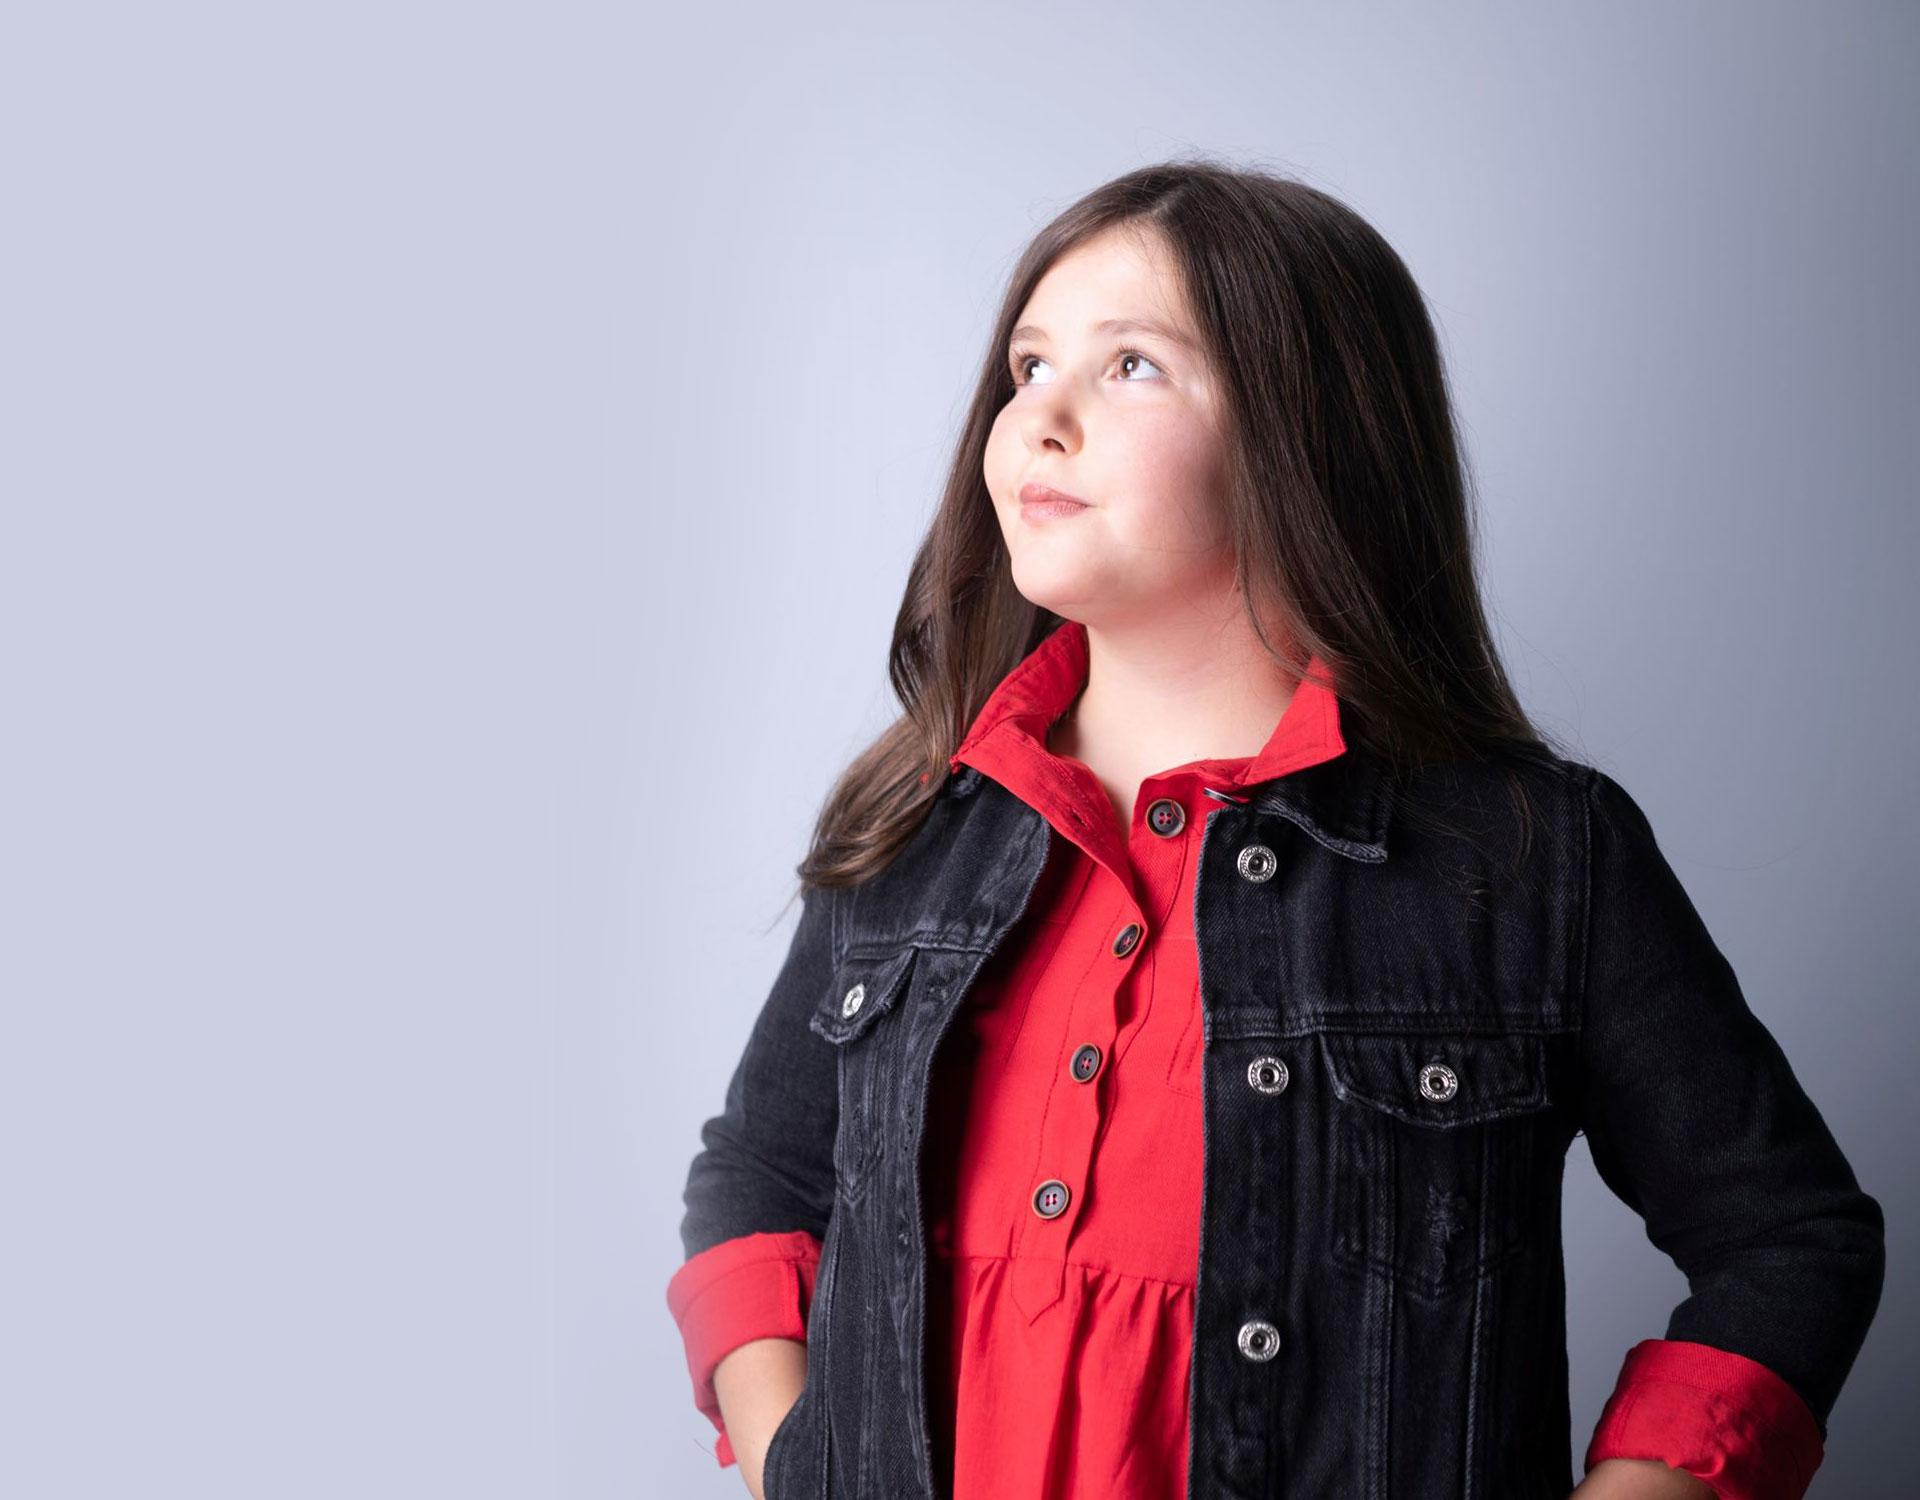 JOANA ALMEIDA - Junior Eurovision Song Contest background image